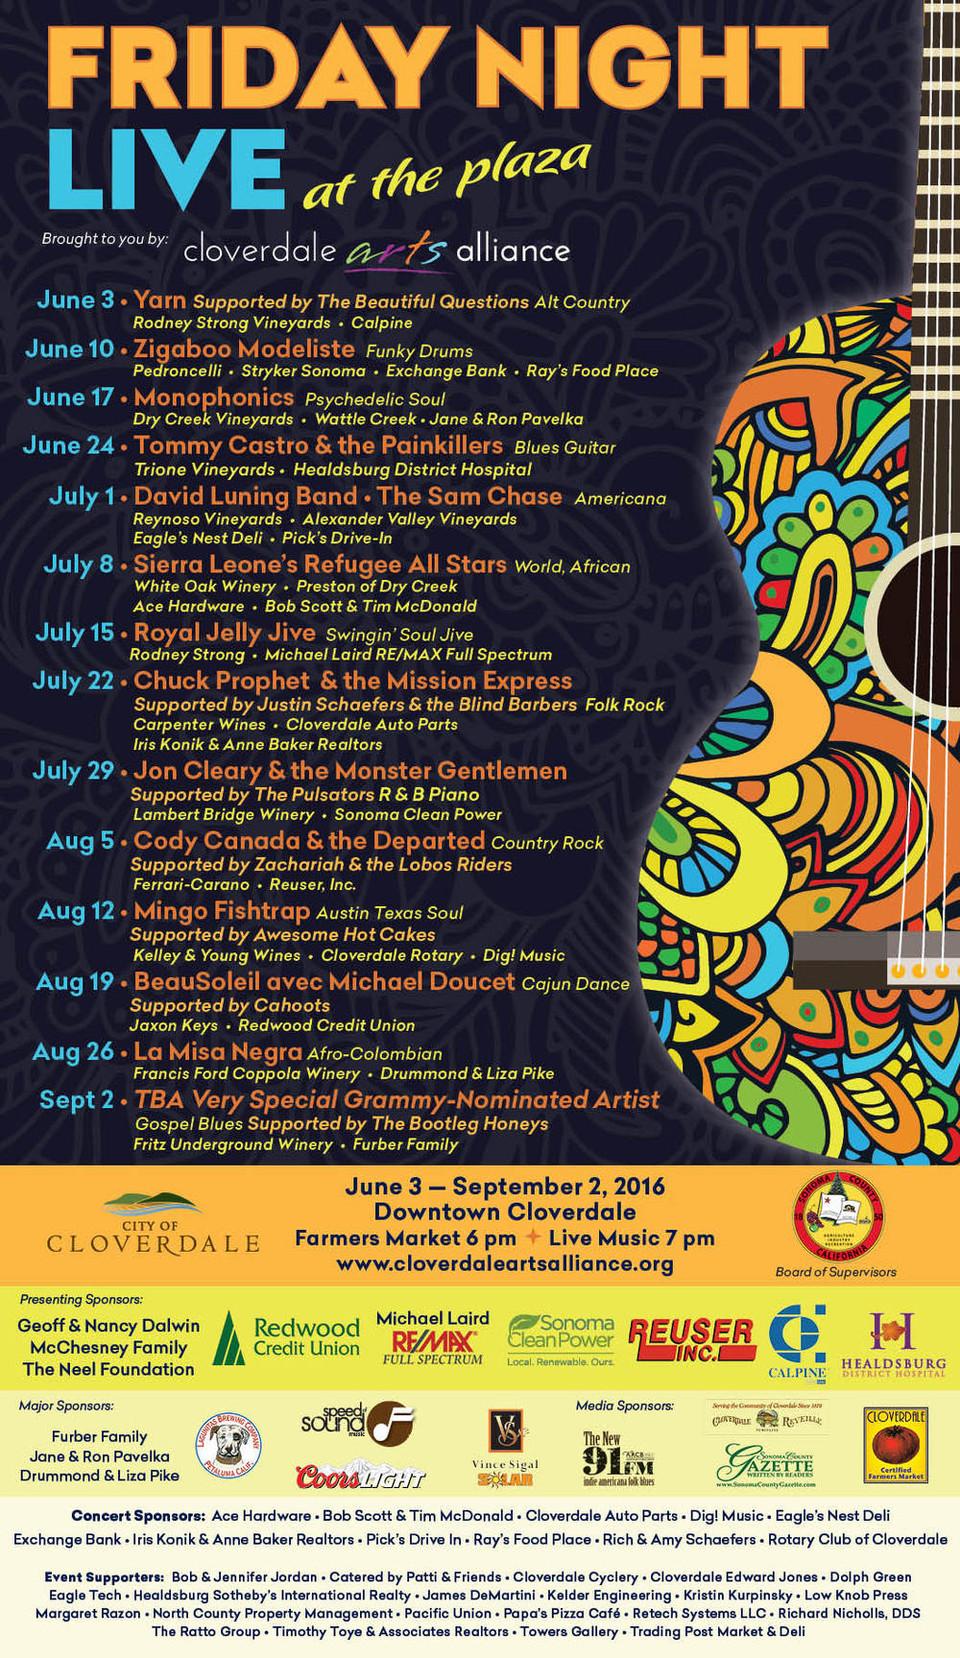 Cloverdale Arts Alliance - Friday Night Live!